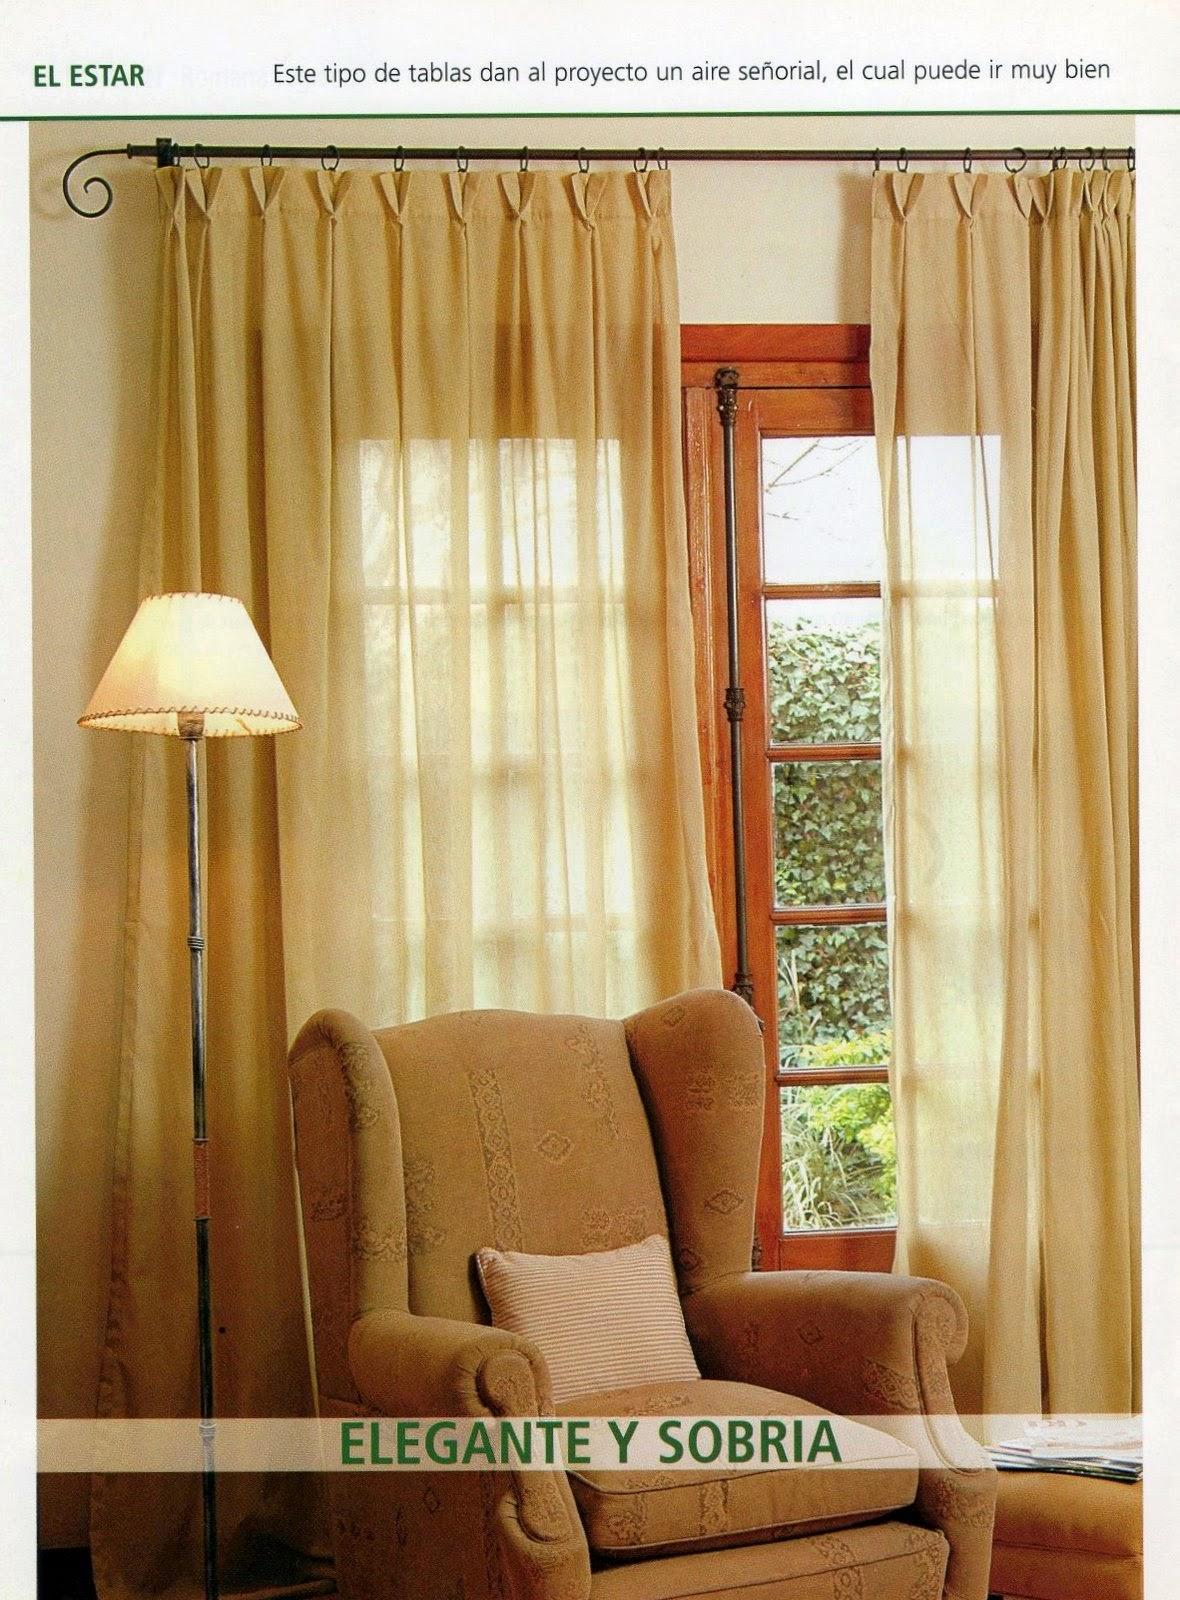 Como hacer cortinas paso a paso revistas de manualidades for Como hacer cortinas corredizas